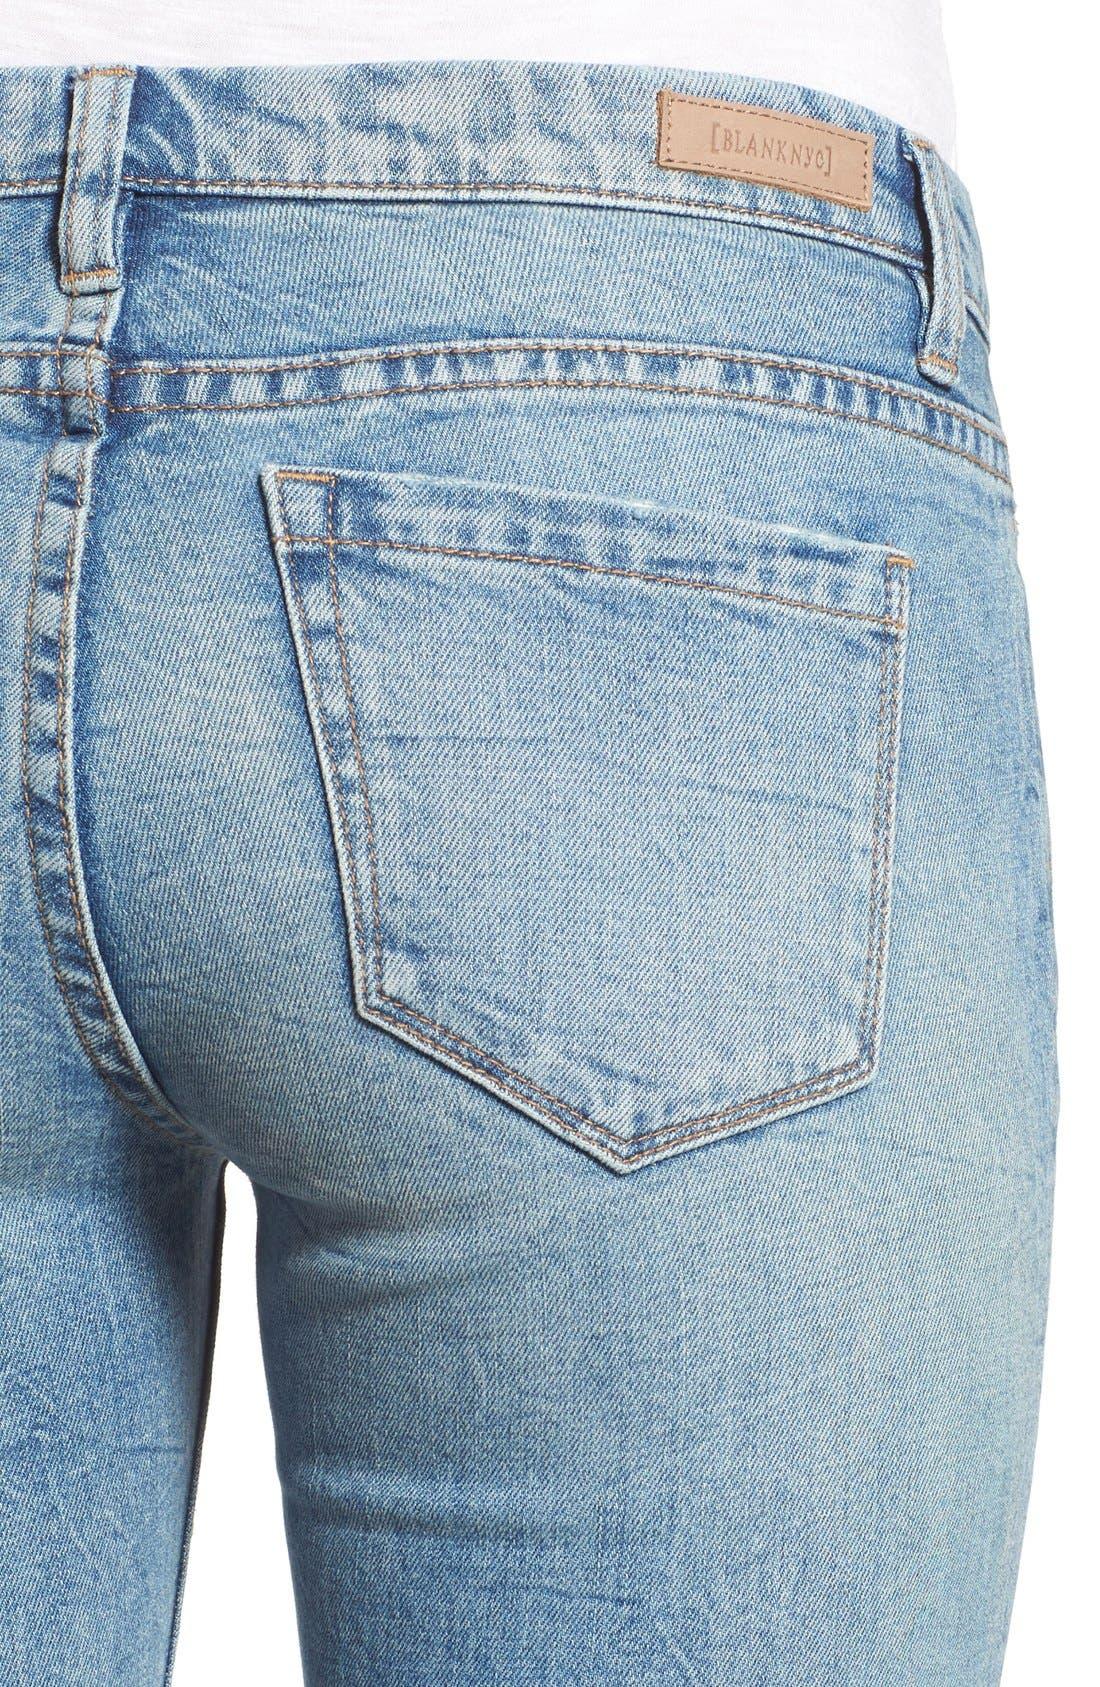 BLANKNYC, 'Skinny Dipper' Distressed Skinny Jeans, Alternate thumbnail 2, color, 400